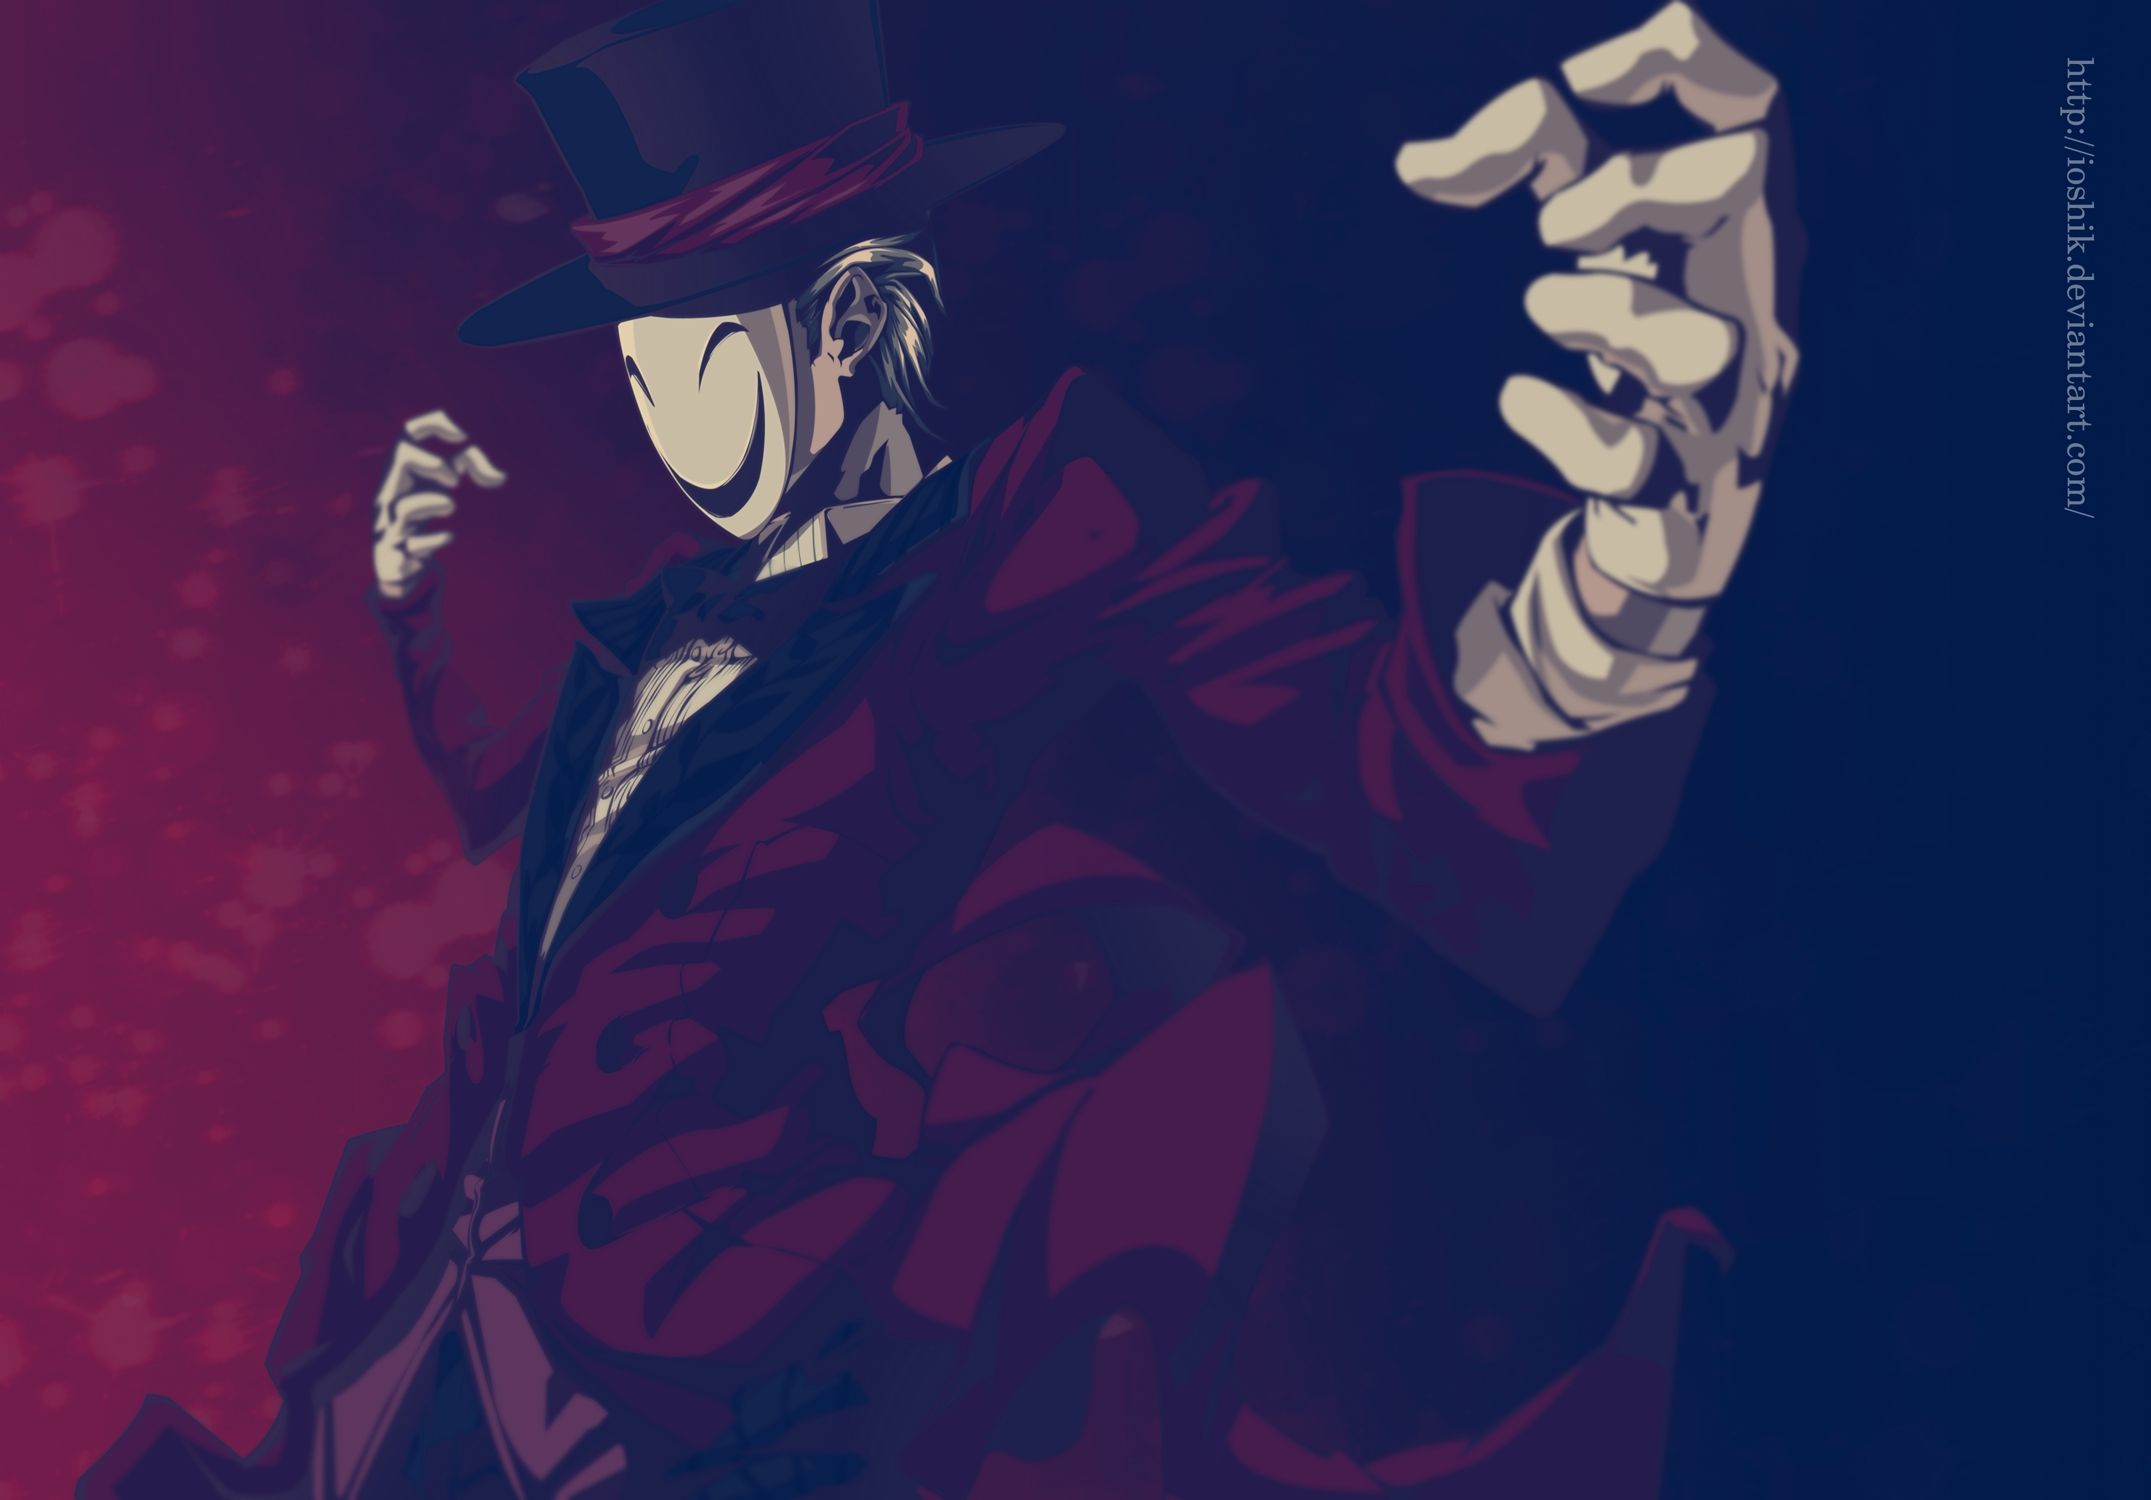 Black Bullet Computer Wallpapers Desktop Backgrounds 2151x1500 Id 633111 Black Bullet Anime Manga Collection